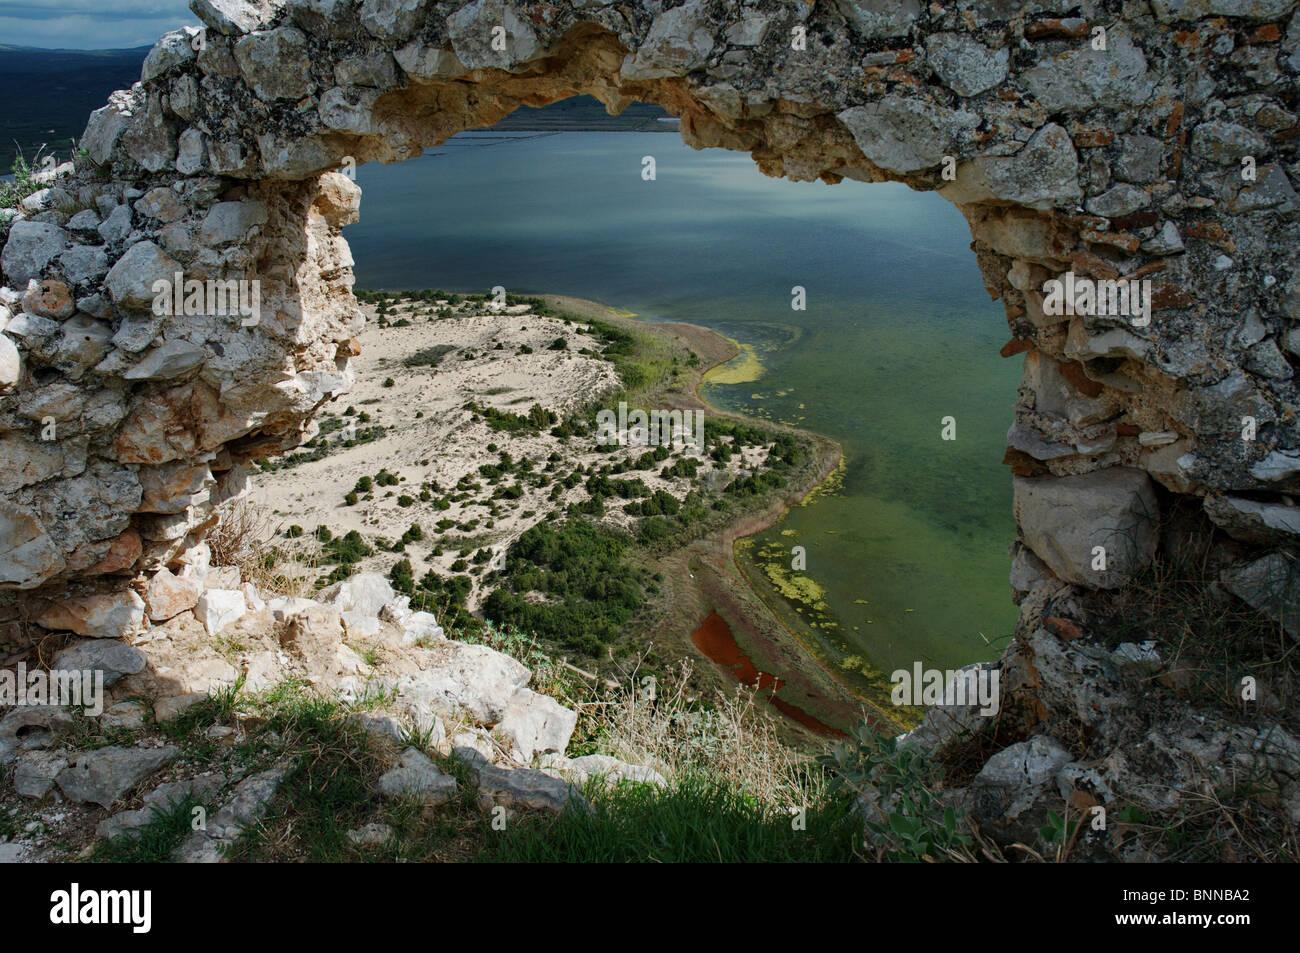 Voidokilía Navarino Pylos Divari lagoon lagoon dune dunes sea Peloponnese Griechenland Greece Mediterranean - Stock Image